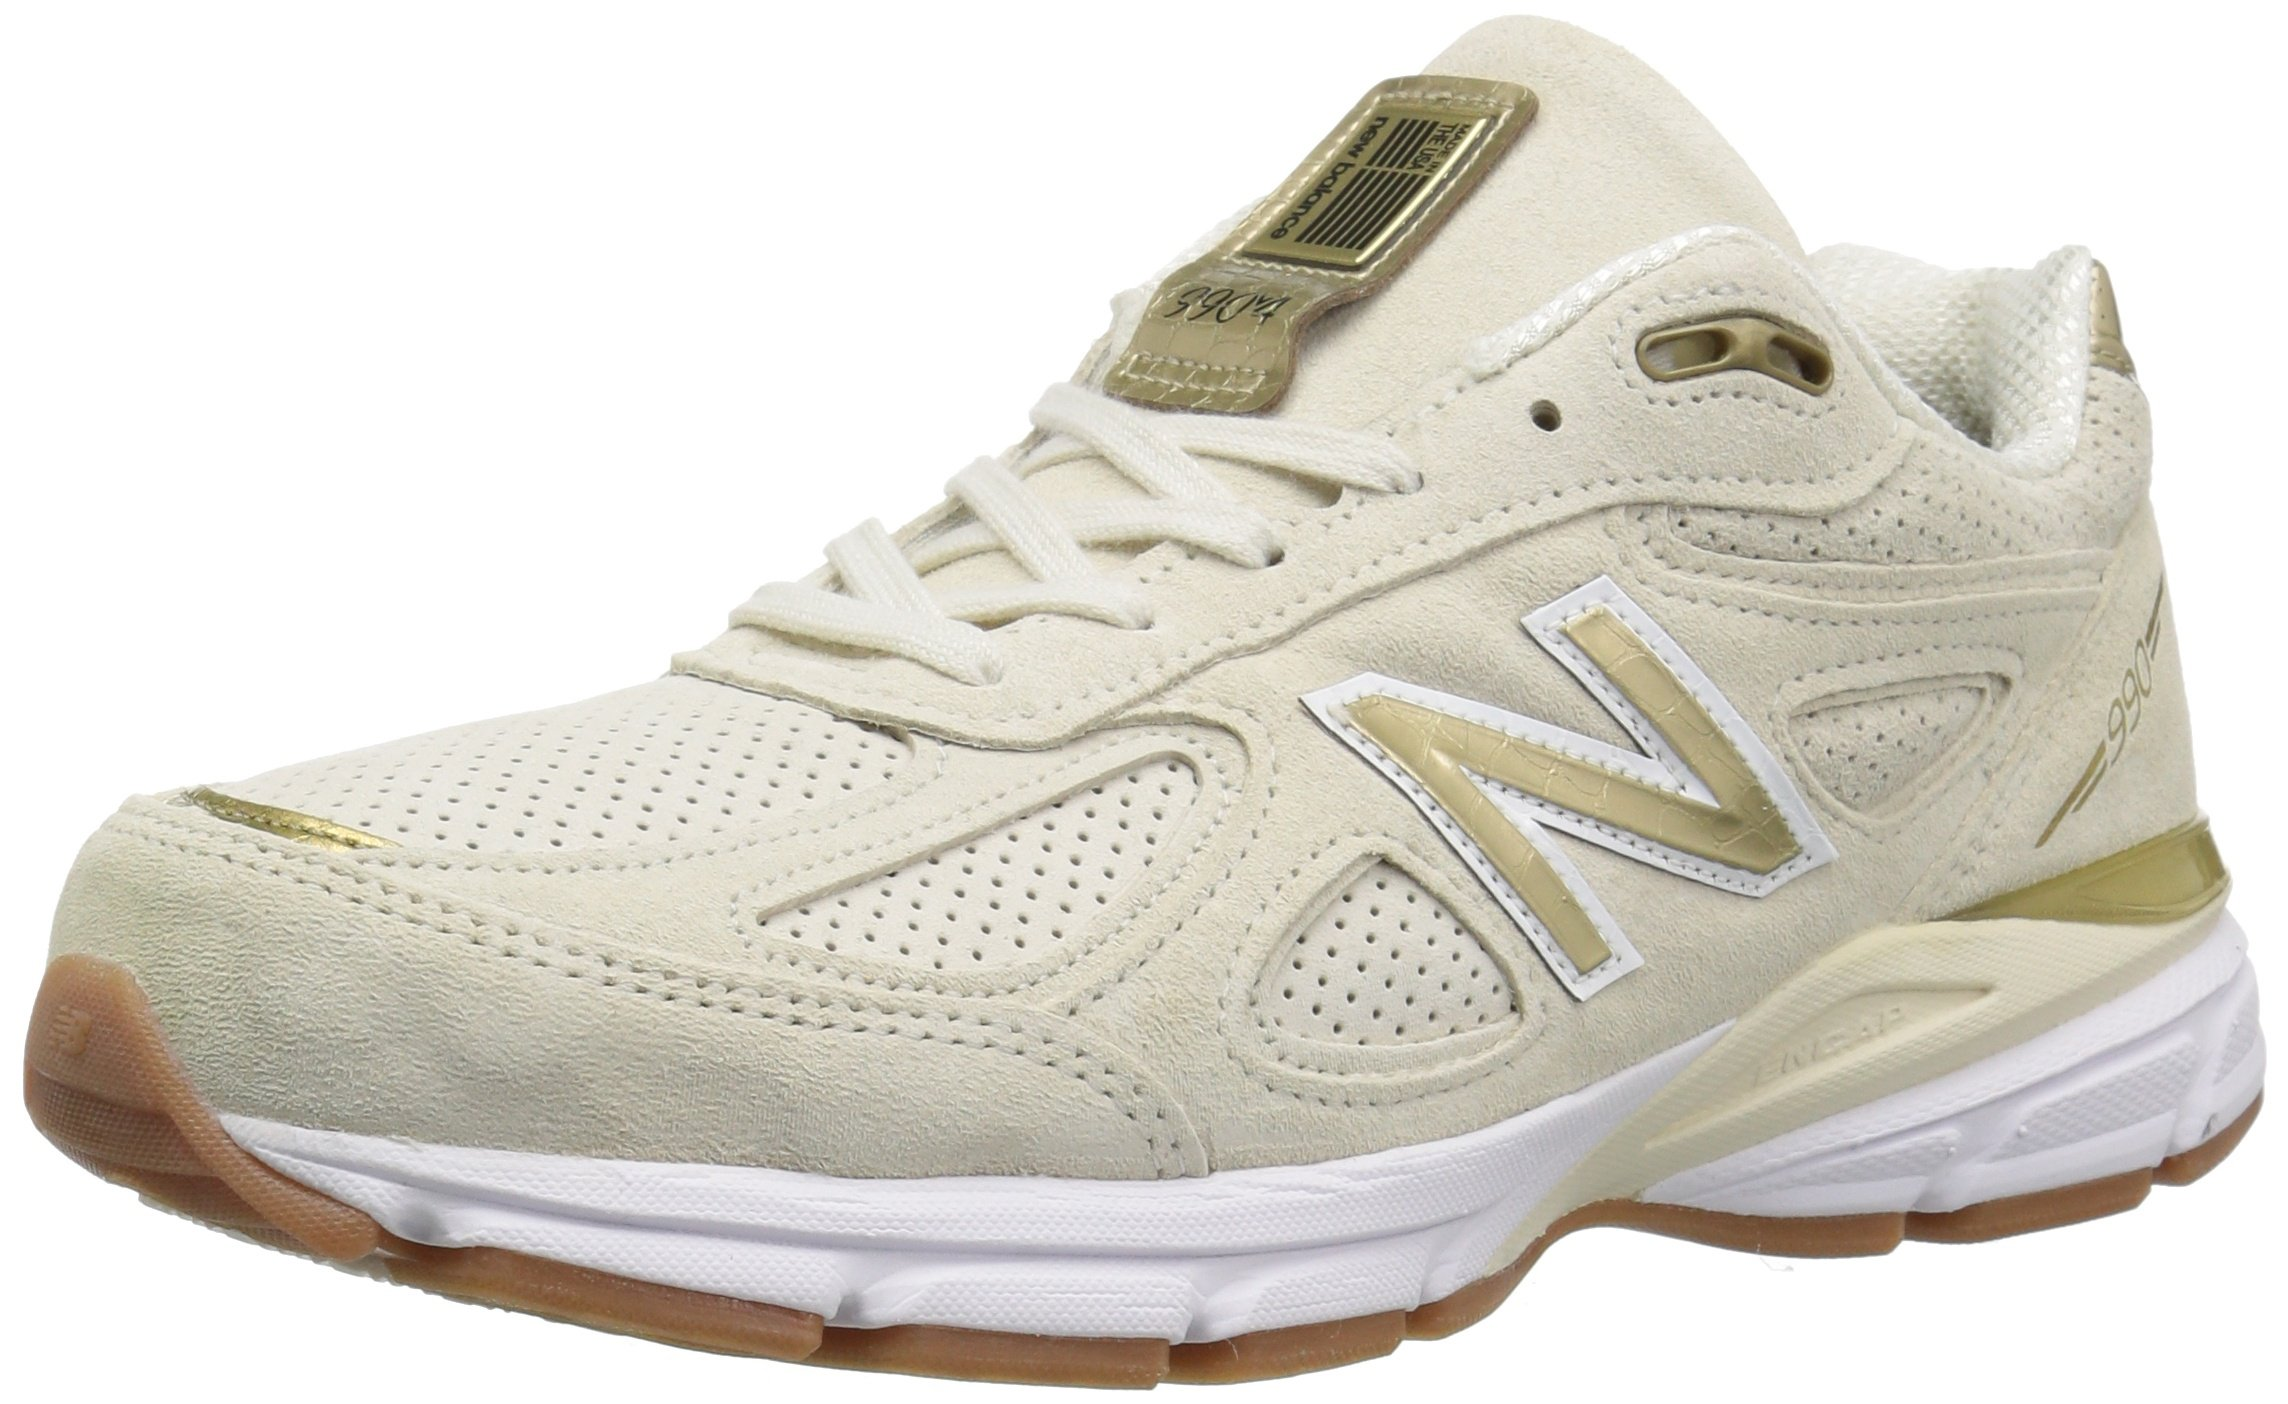 New Balance Men's 990v4 Running Shoe, Angora/White, 7 D US by New Balance (Image #1)